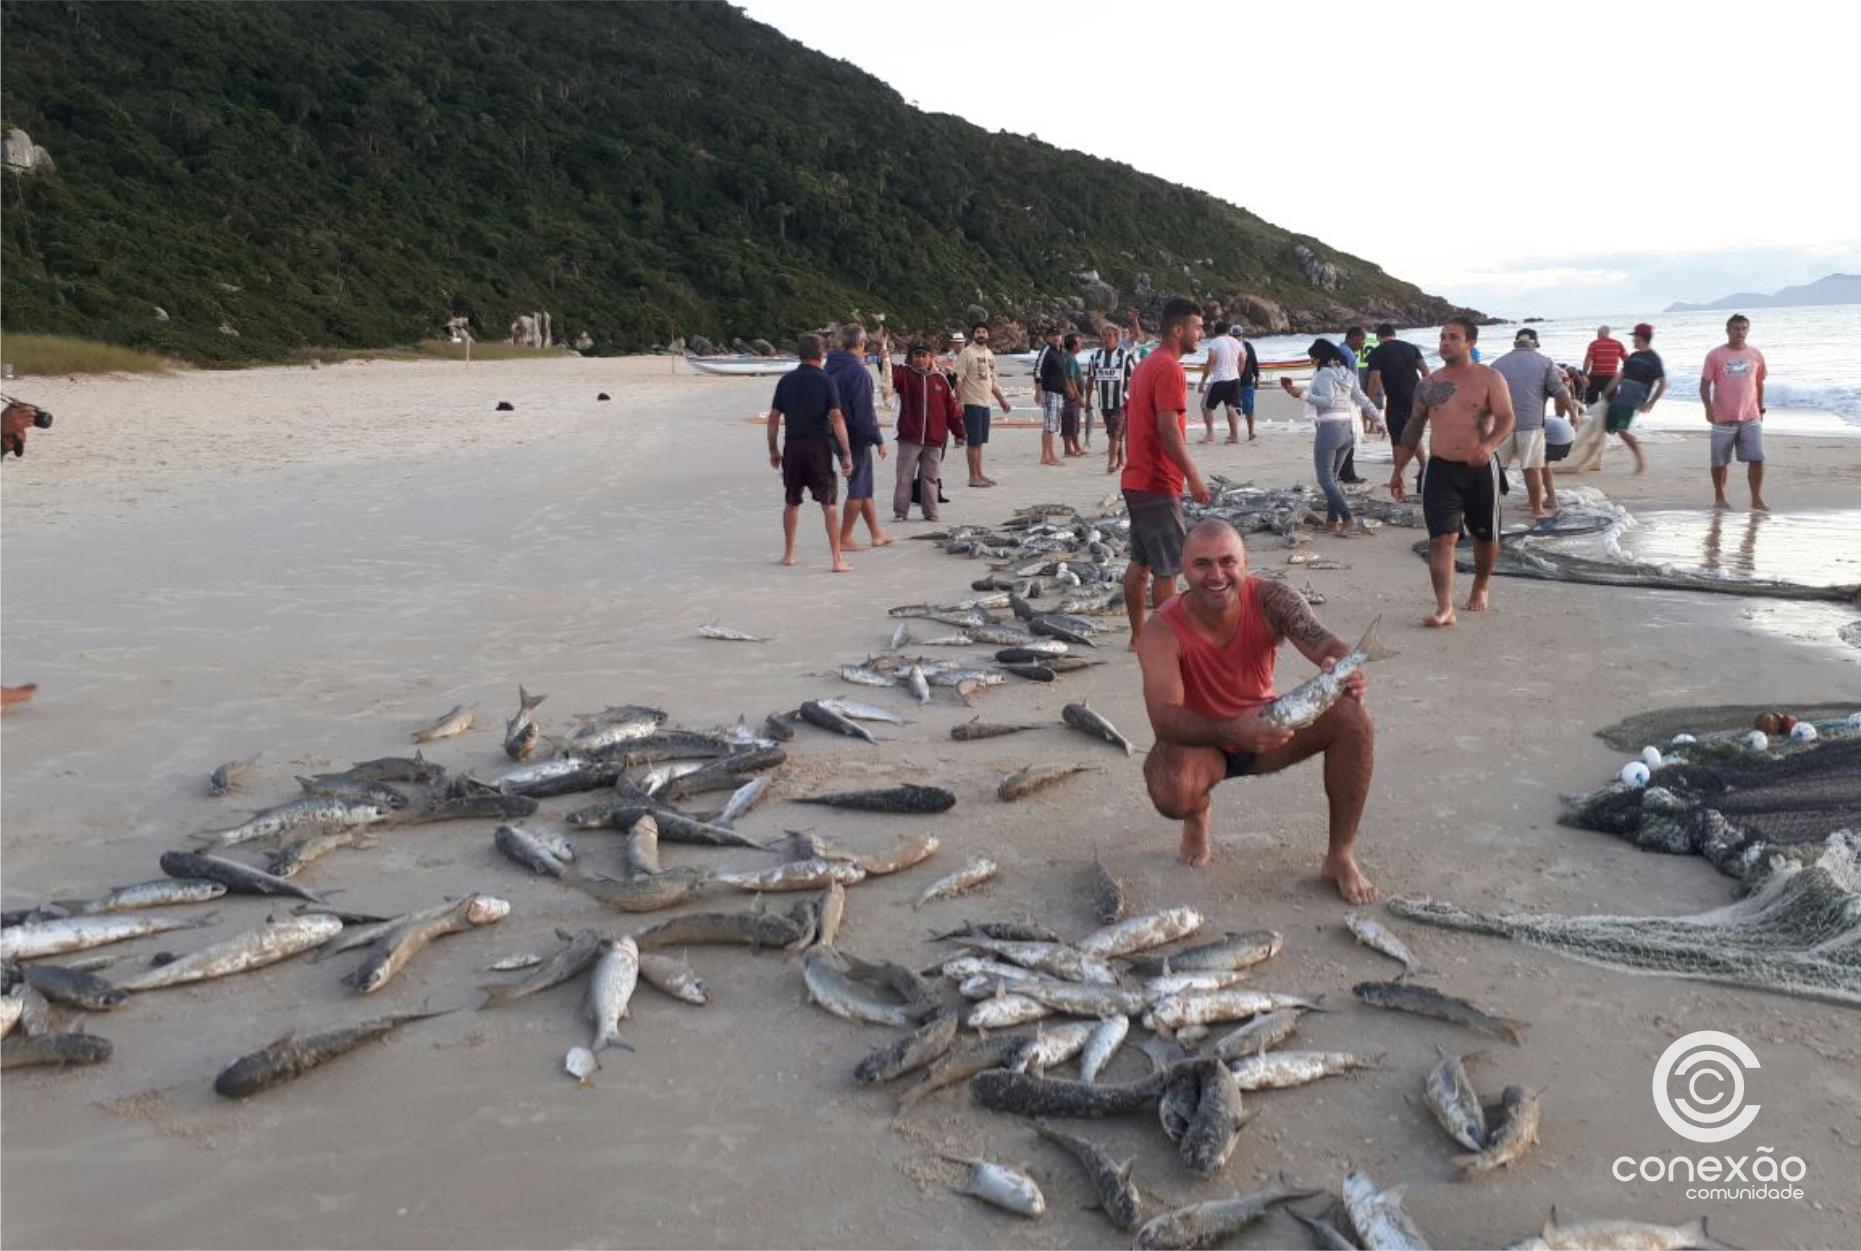 Primeiro lanço de tainha é feito por pescadores da Praia dos Ingleses no Norte da Ilha